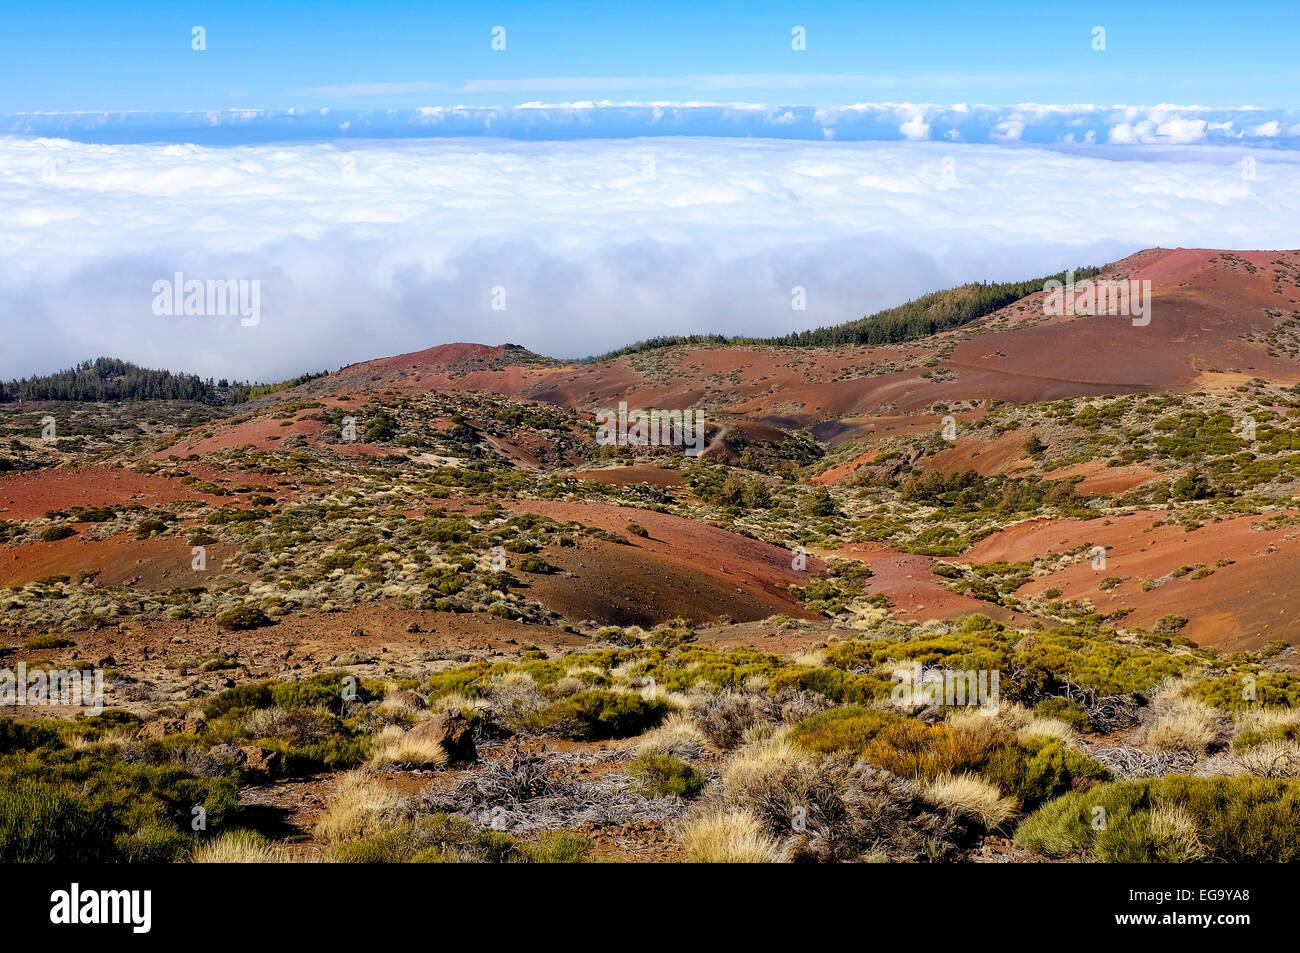 Teide National Park,  Tenerife, Canary Islands, Spain - Stock Image